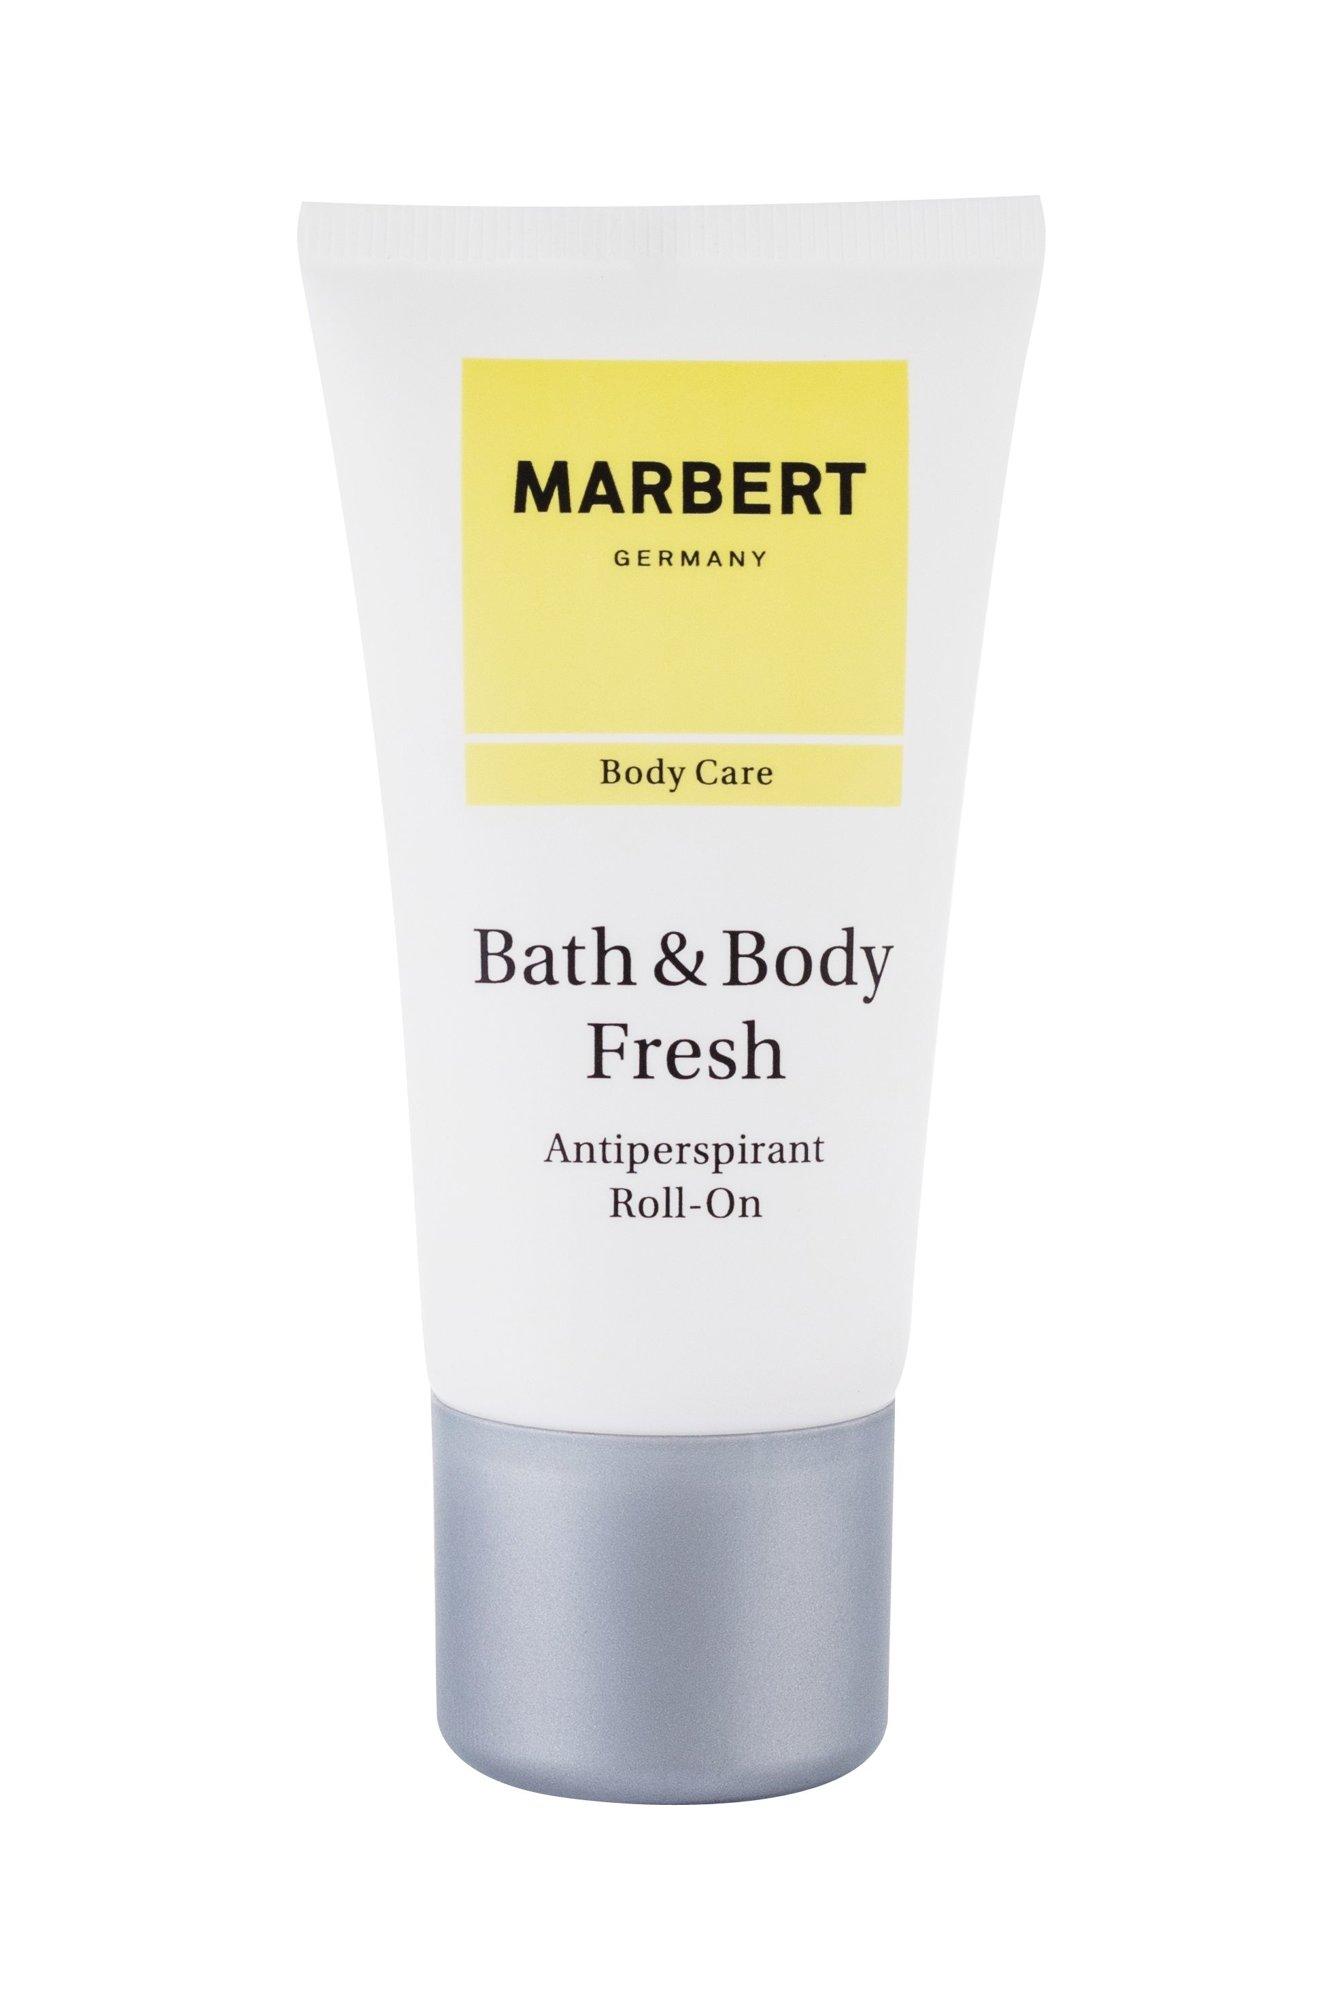 Marbert Bath & Body Fresh Antiperspirant 50ml